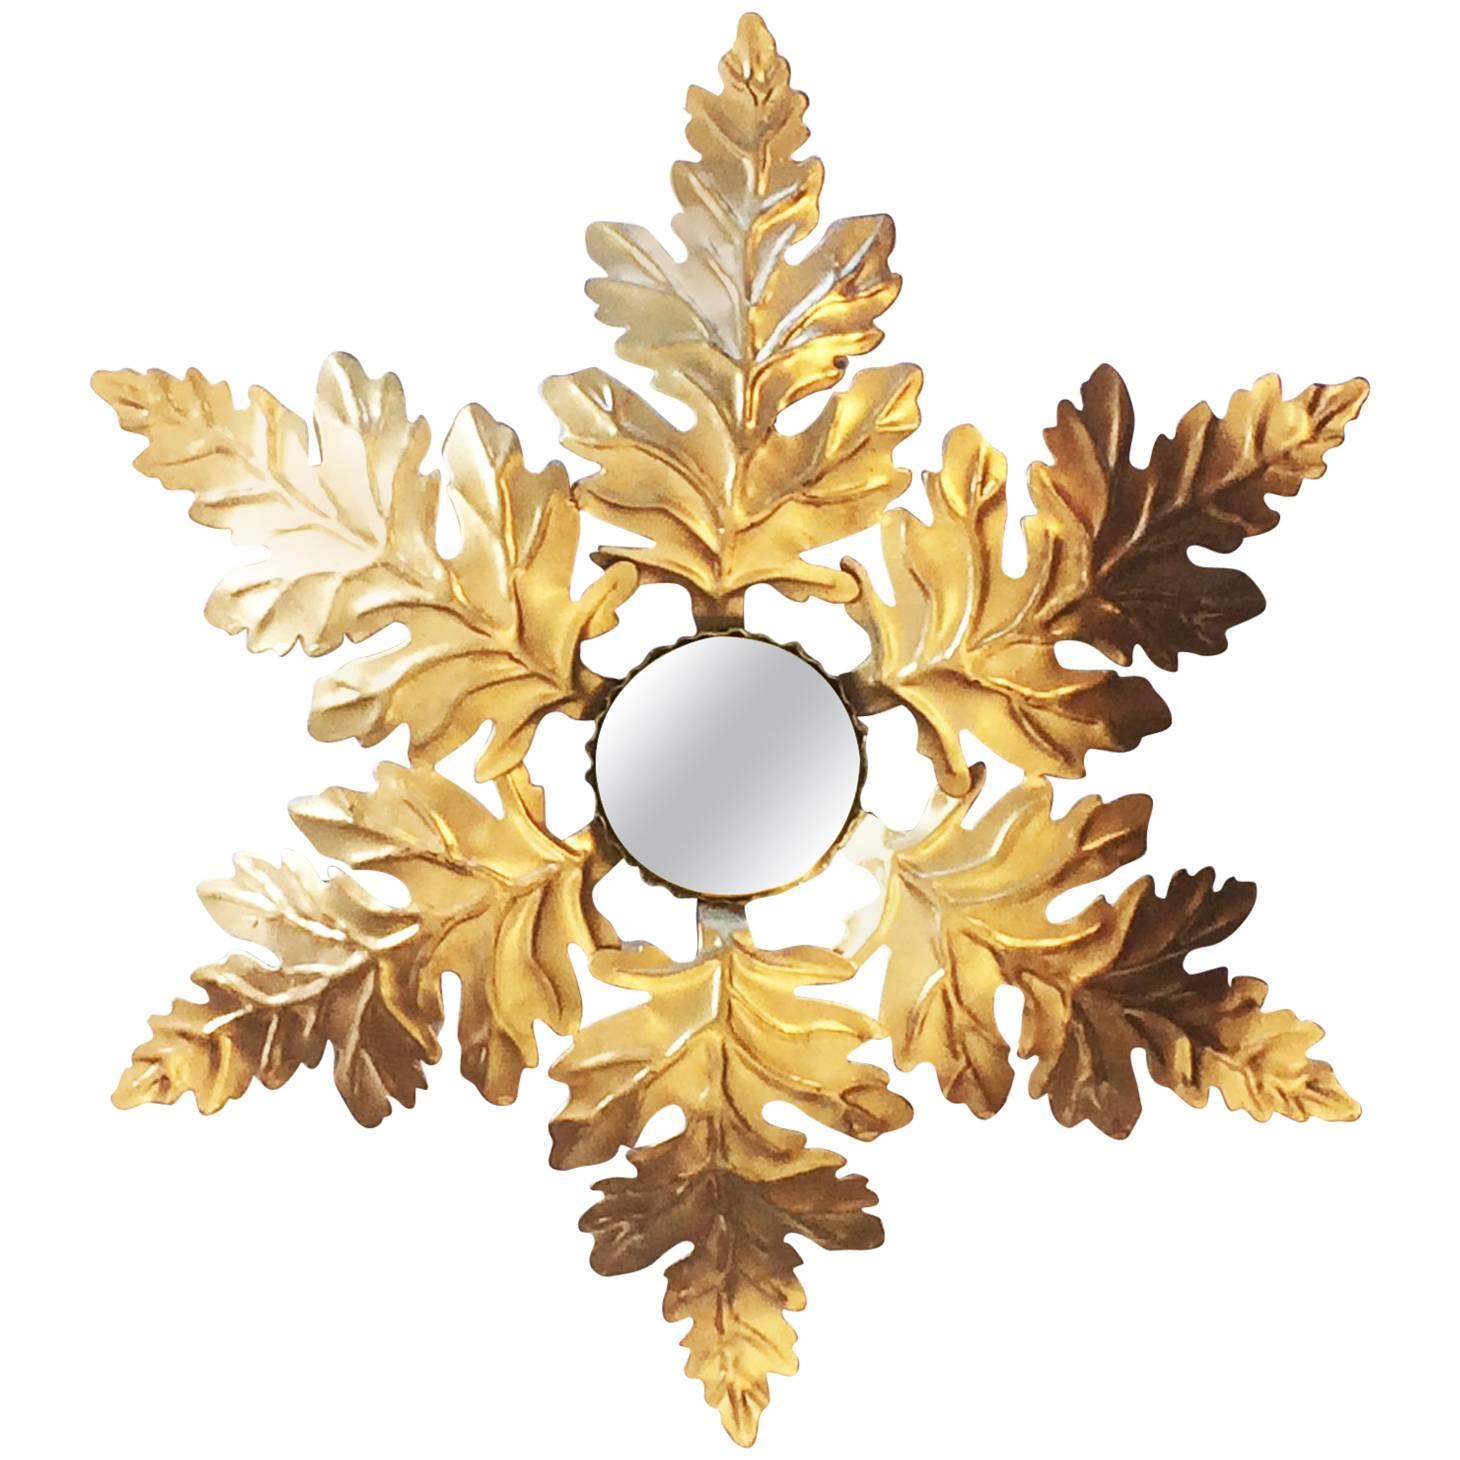 Art Deco 20th Century French Oak Leaf Sunburst Mirror For Sale at ...